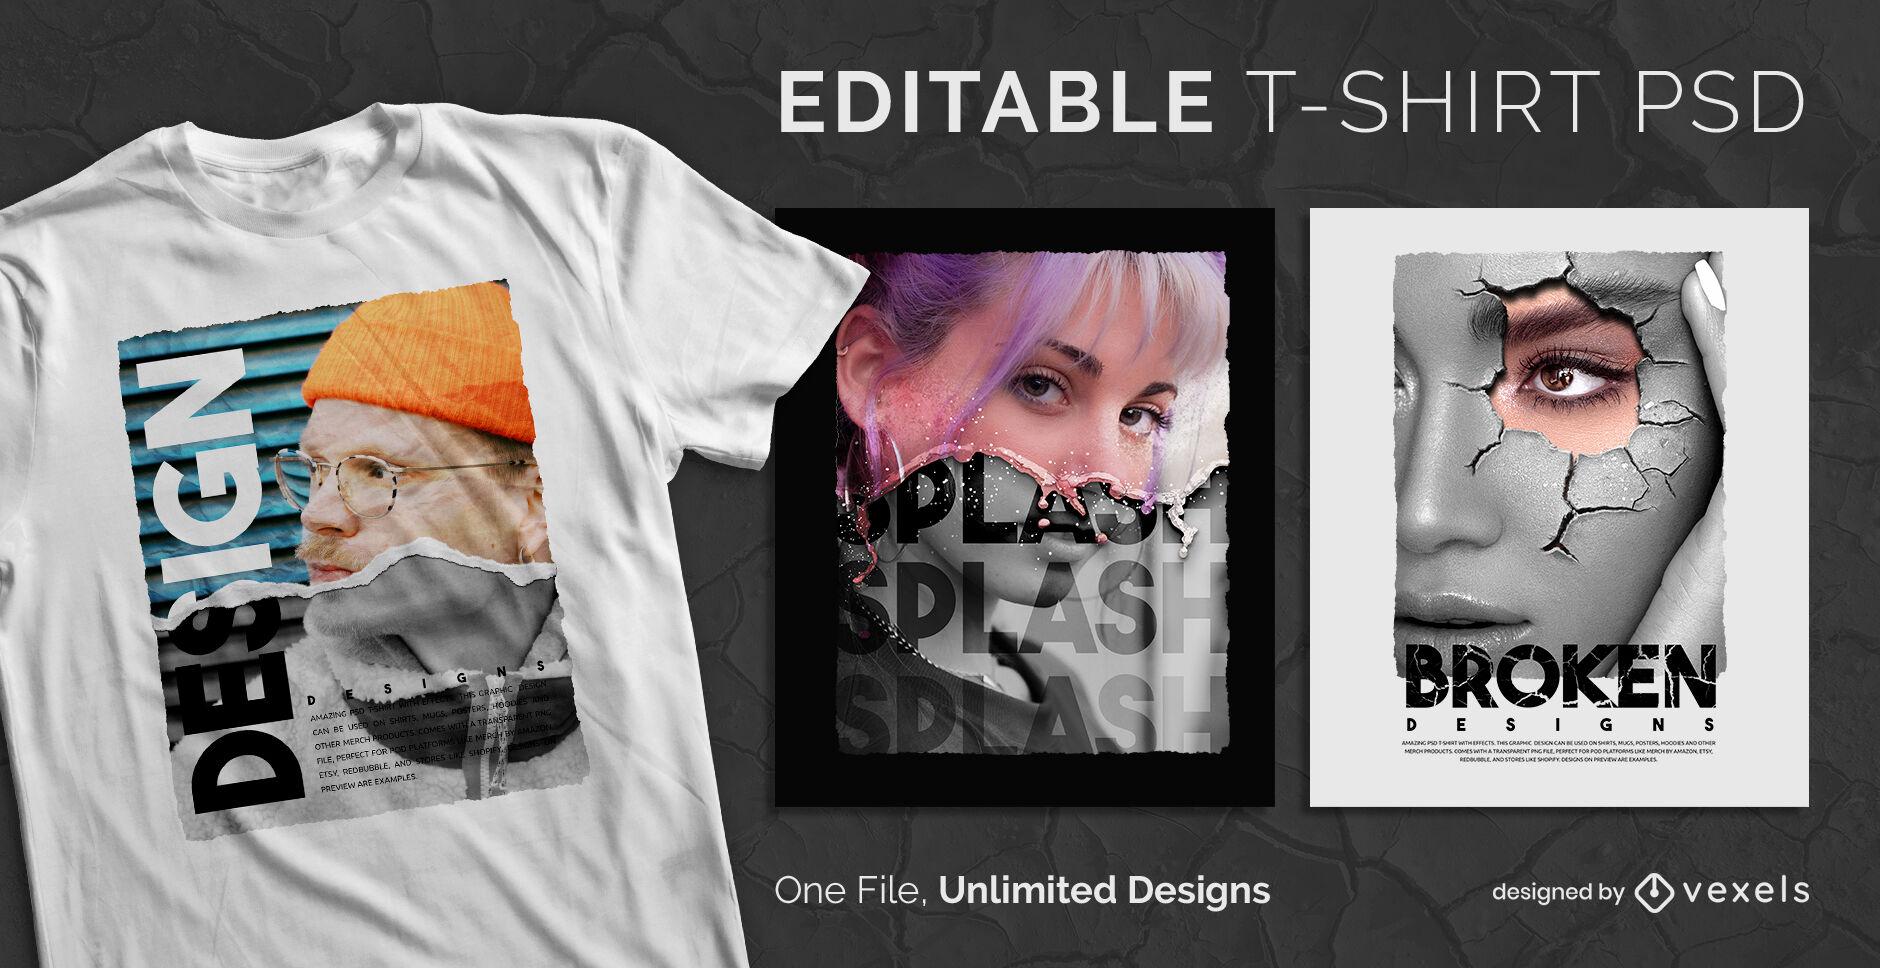 Ripped paper editable psd t-shirt